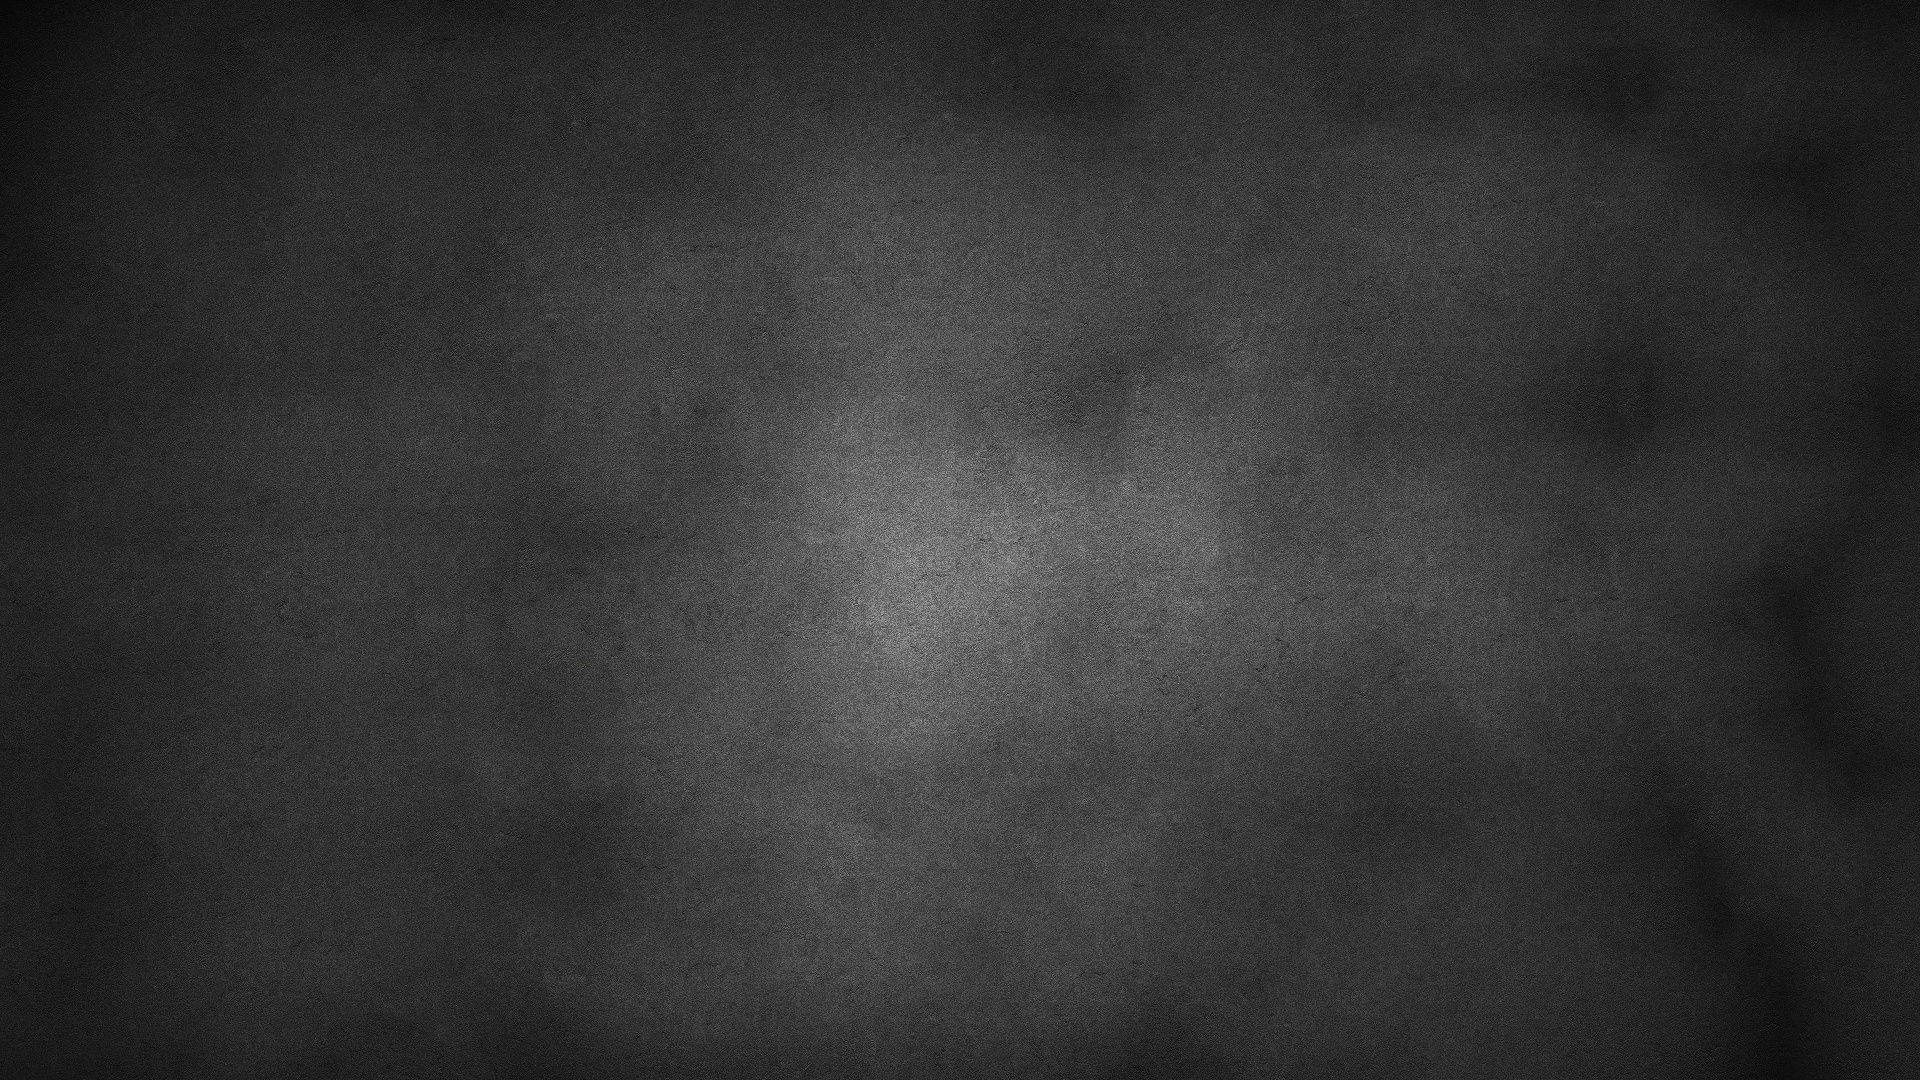 High Resolution Black Background wallpaper pc